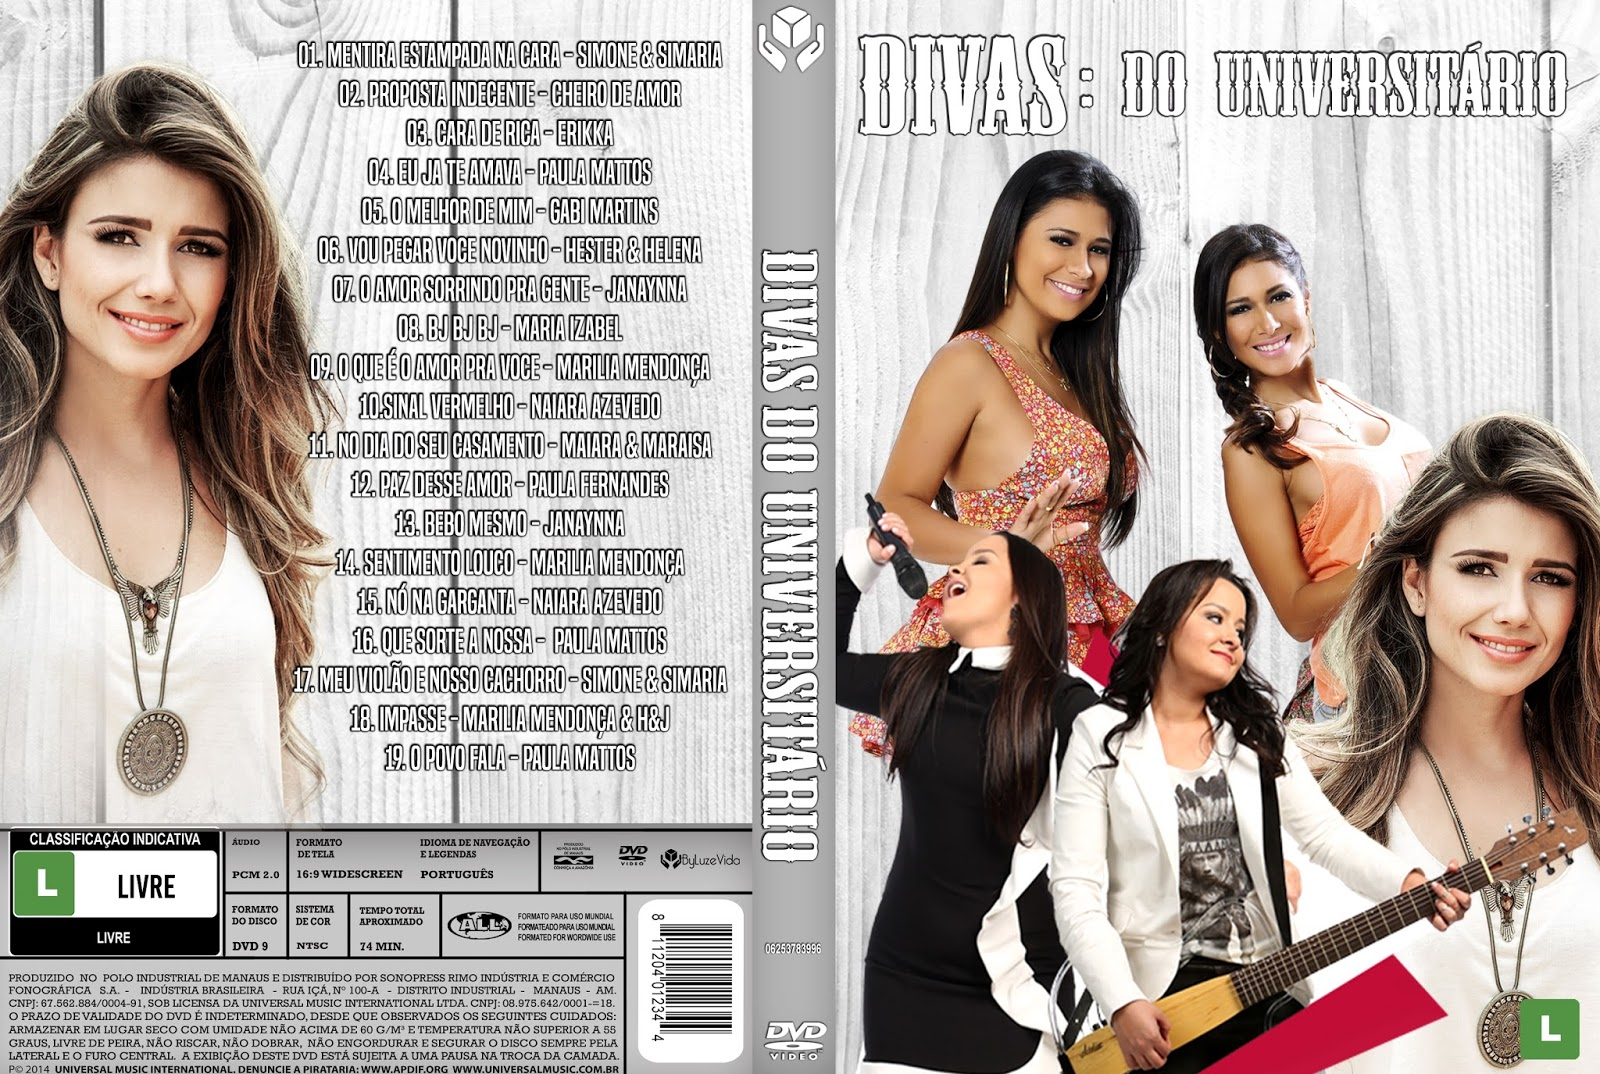 Divas Do Universitário DVD-R Divas 2BDo 2BUniversit 25C3 25A1rio 2BDVD R 2BXANDAODOWNLOAD